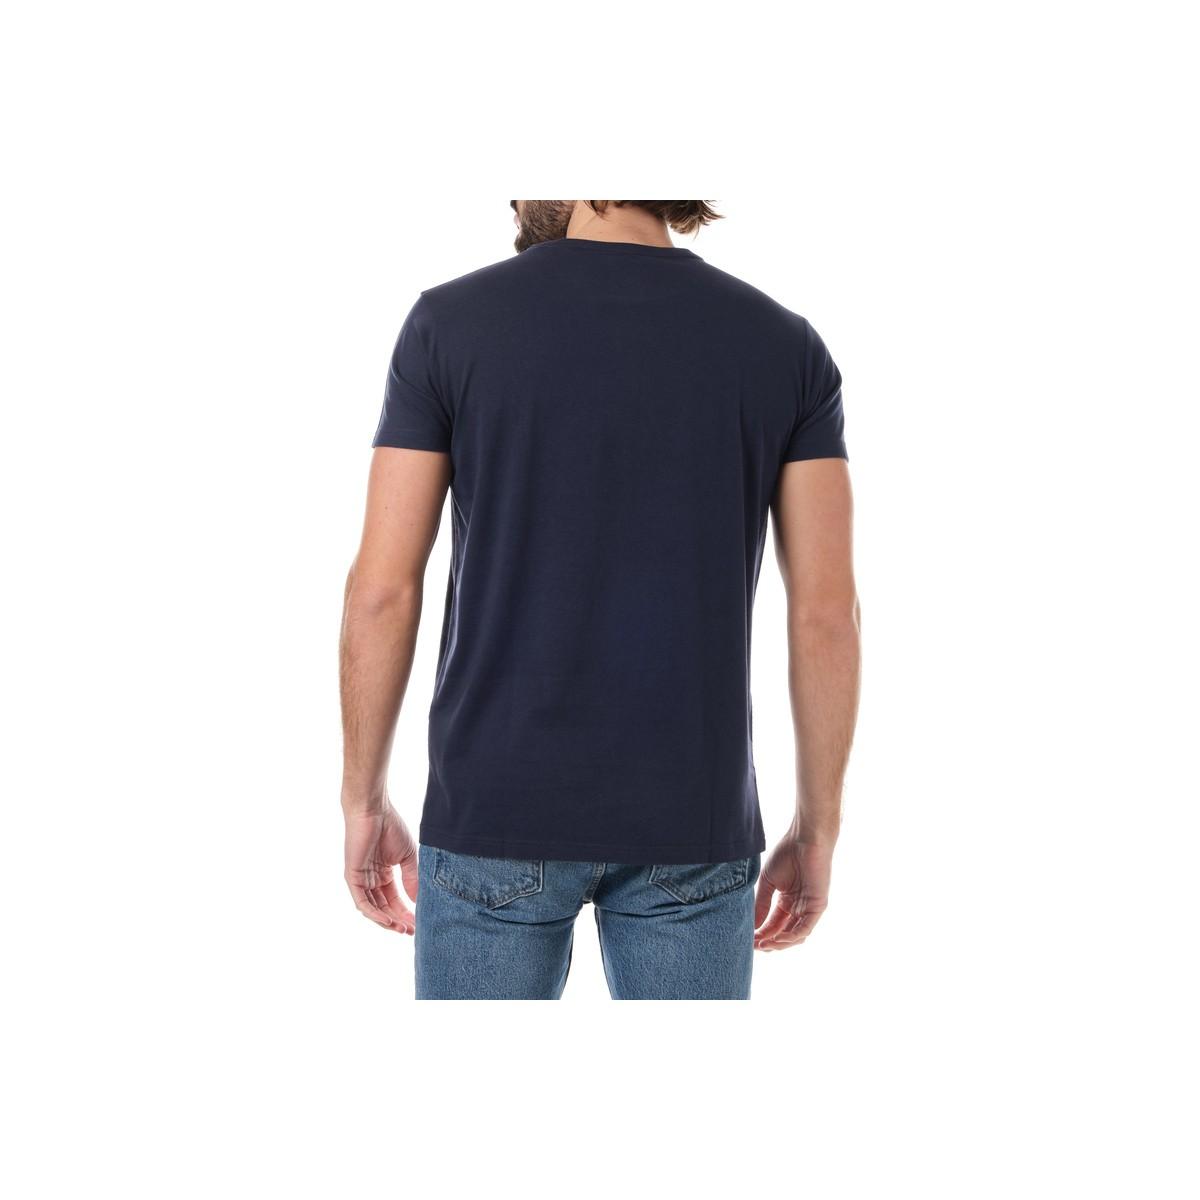 T-shirt Sabo